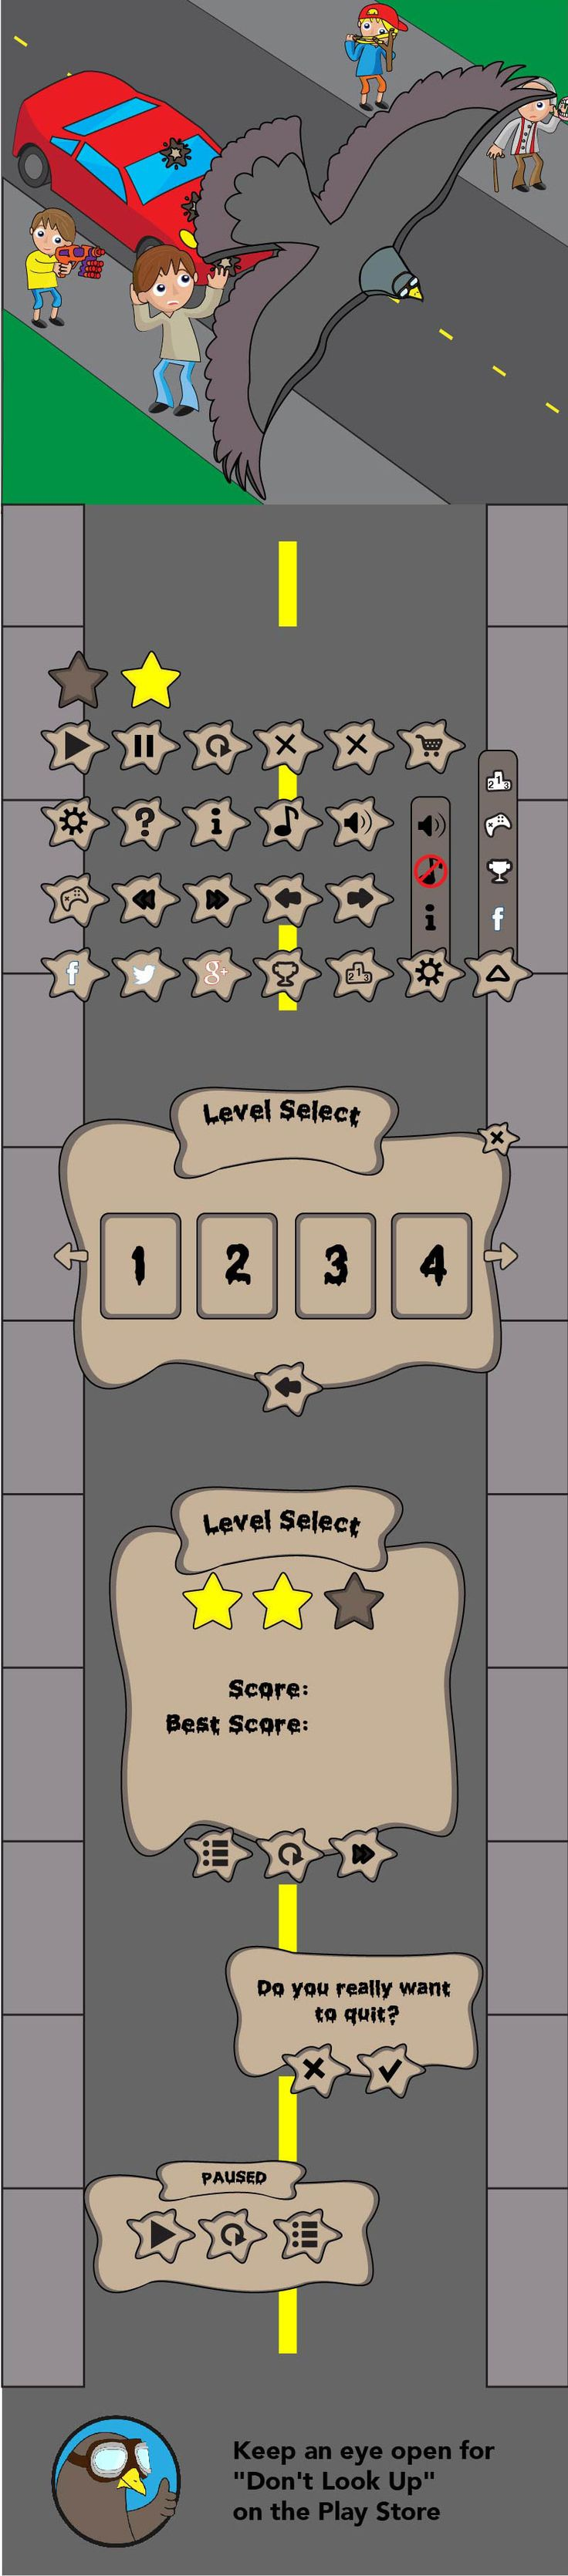 "UI Design for Baynecorp's upcoming game, ""Don't Look Up"".  www.jonnypye.com www.baynecorp.com #GameDesign #UI #VideoGames"